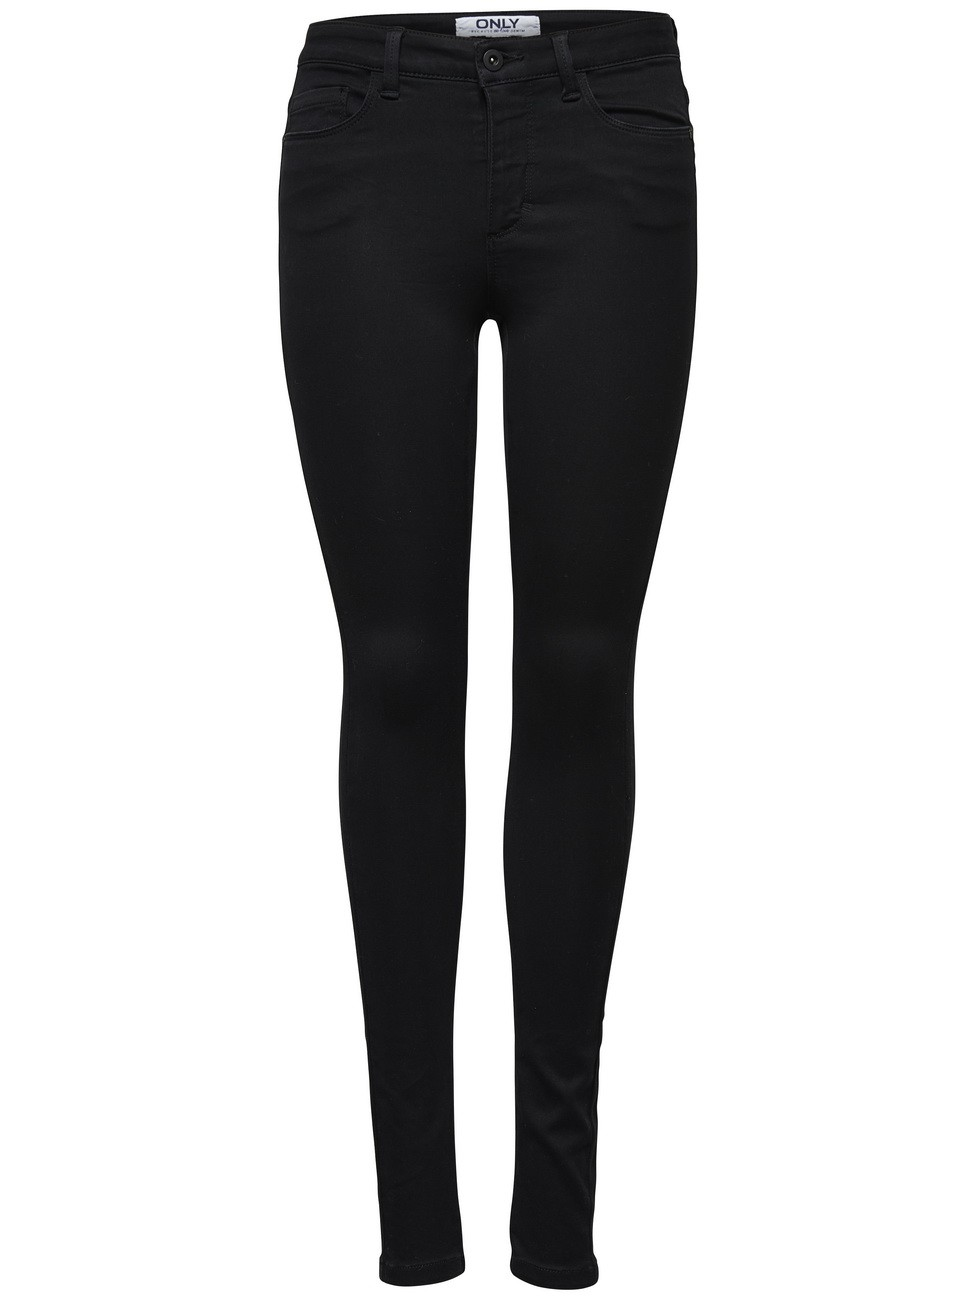 only damen jeans onlroyal high waist kaufen jeans. Black Bedroom Furniture Sets. Home Design Ideas